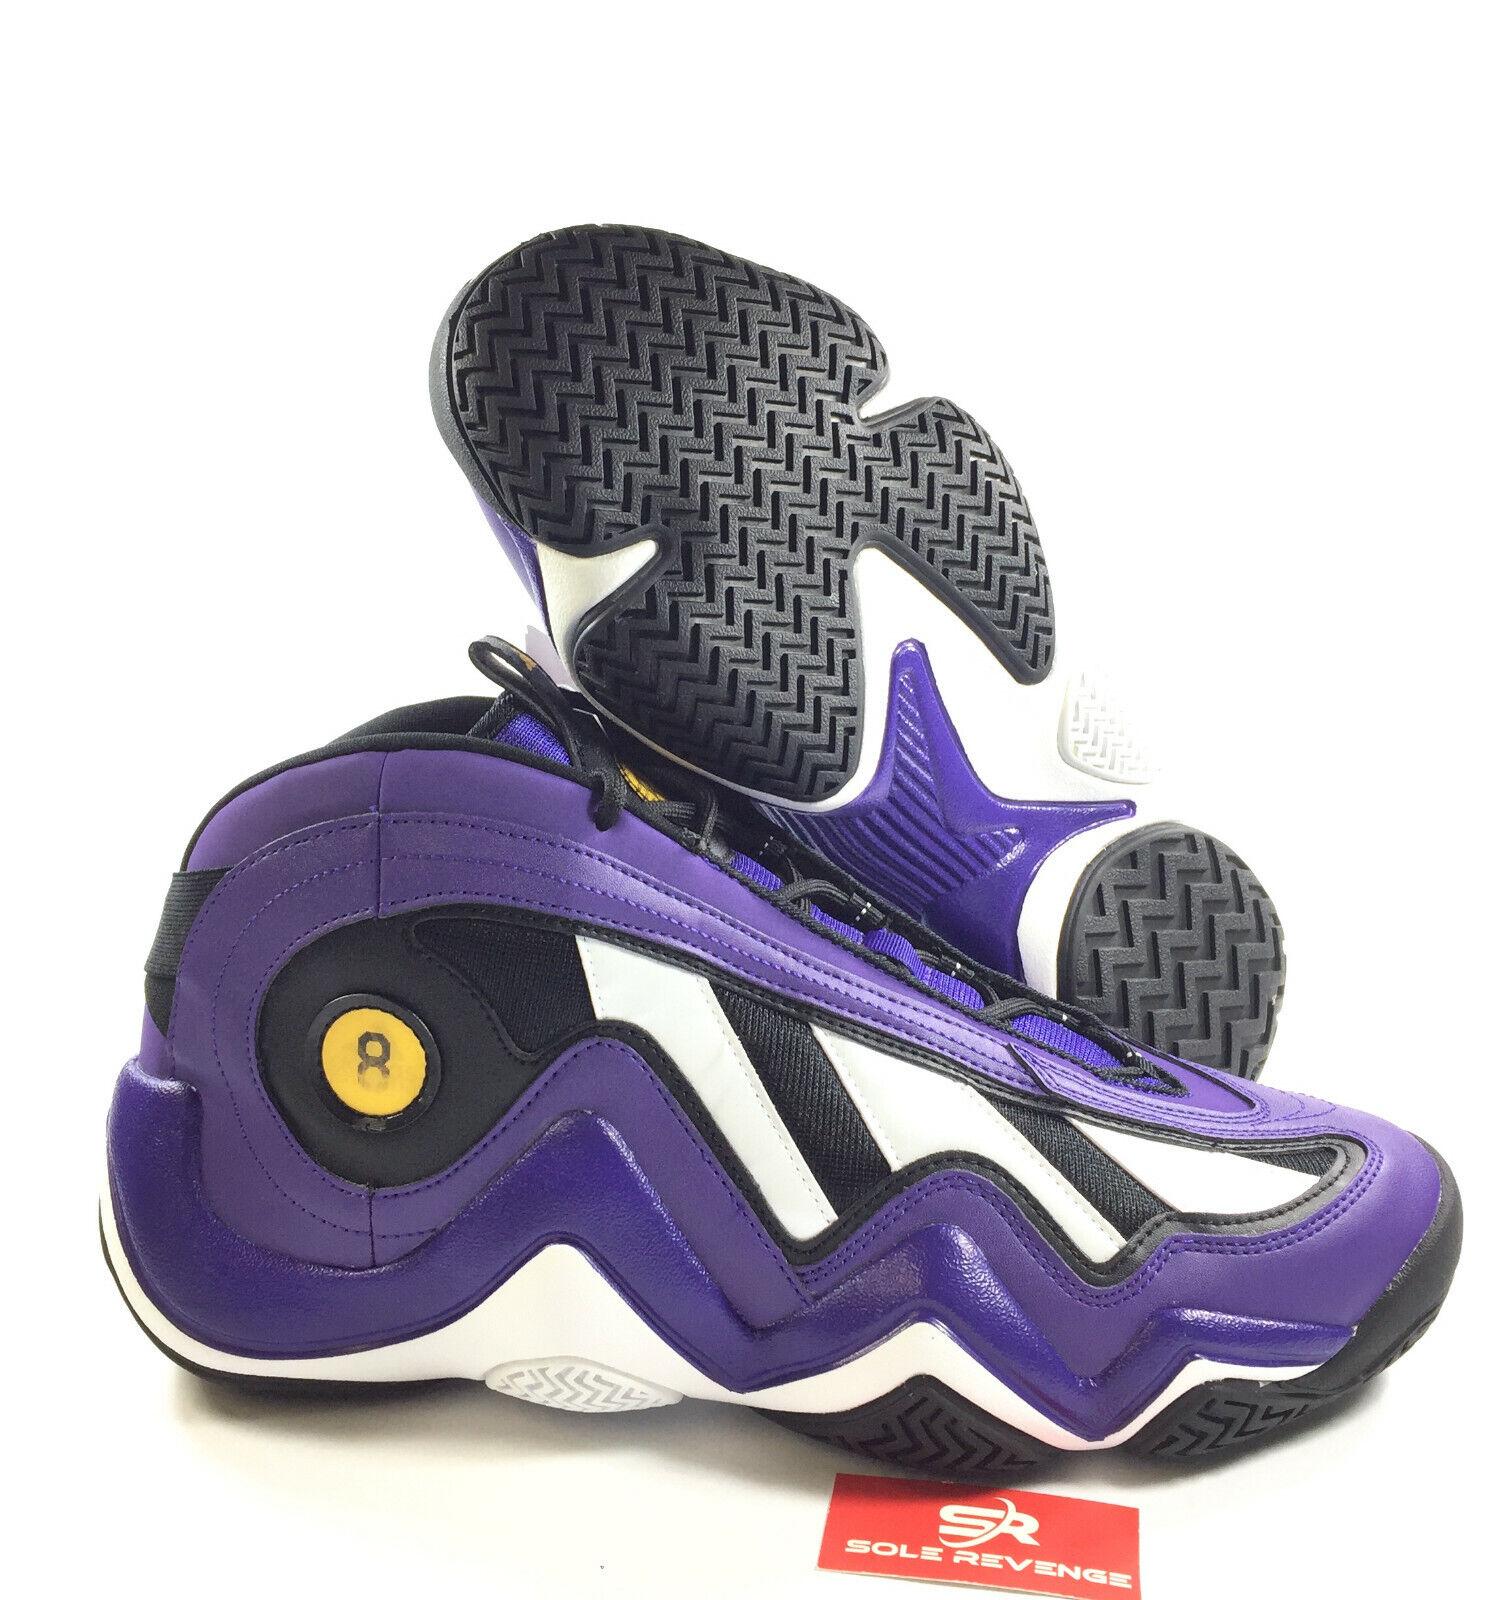 best service d7e43 2dd86 купить Adidas Crazy Kobe Bryant, с доставкой NEW 13 Mens Adidas Crazy 97  EQT Elevation